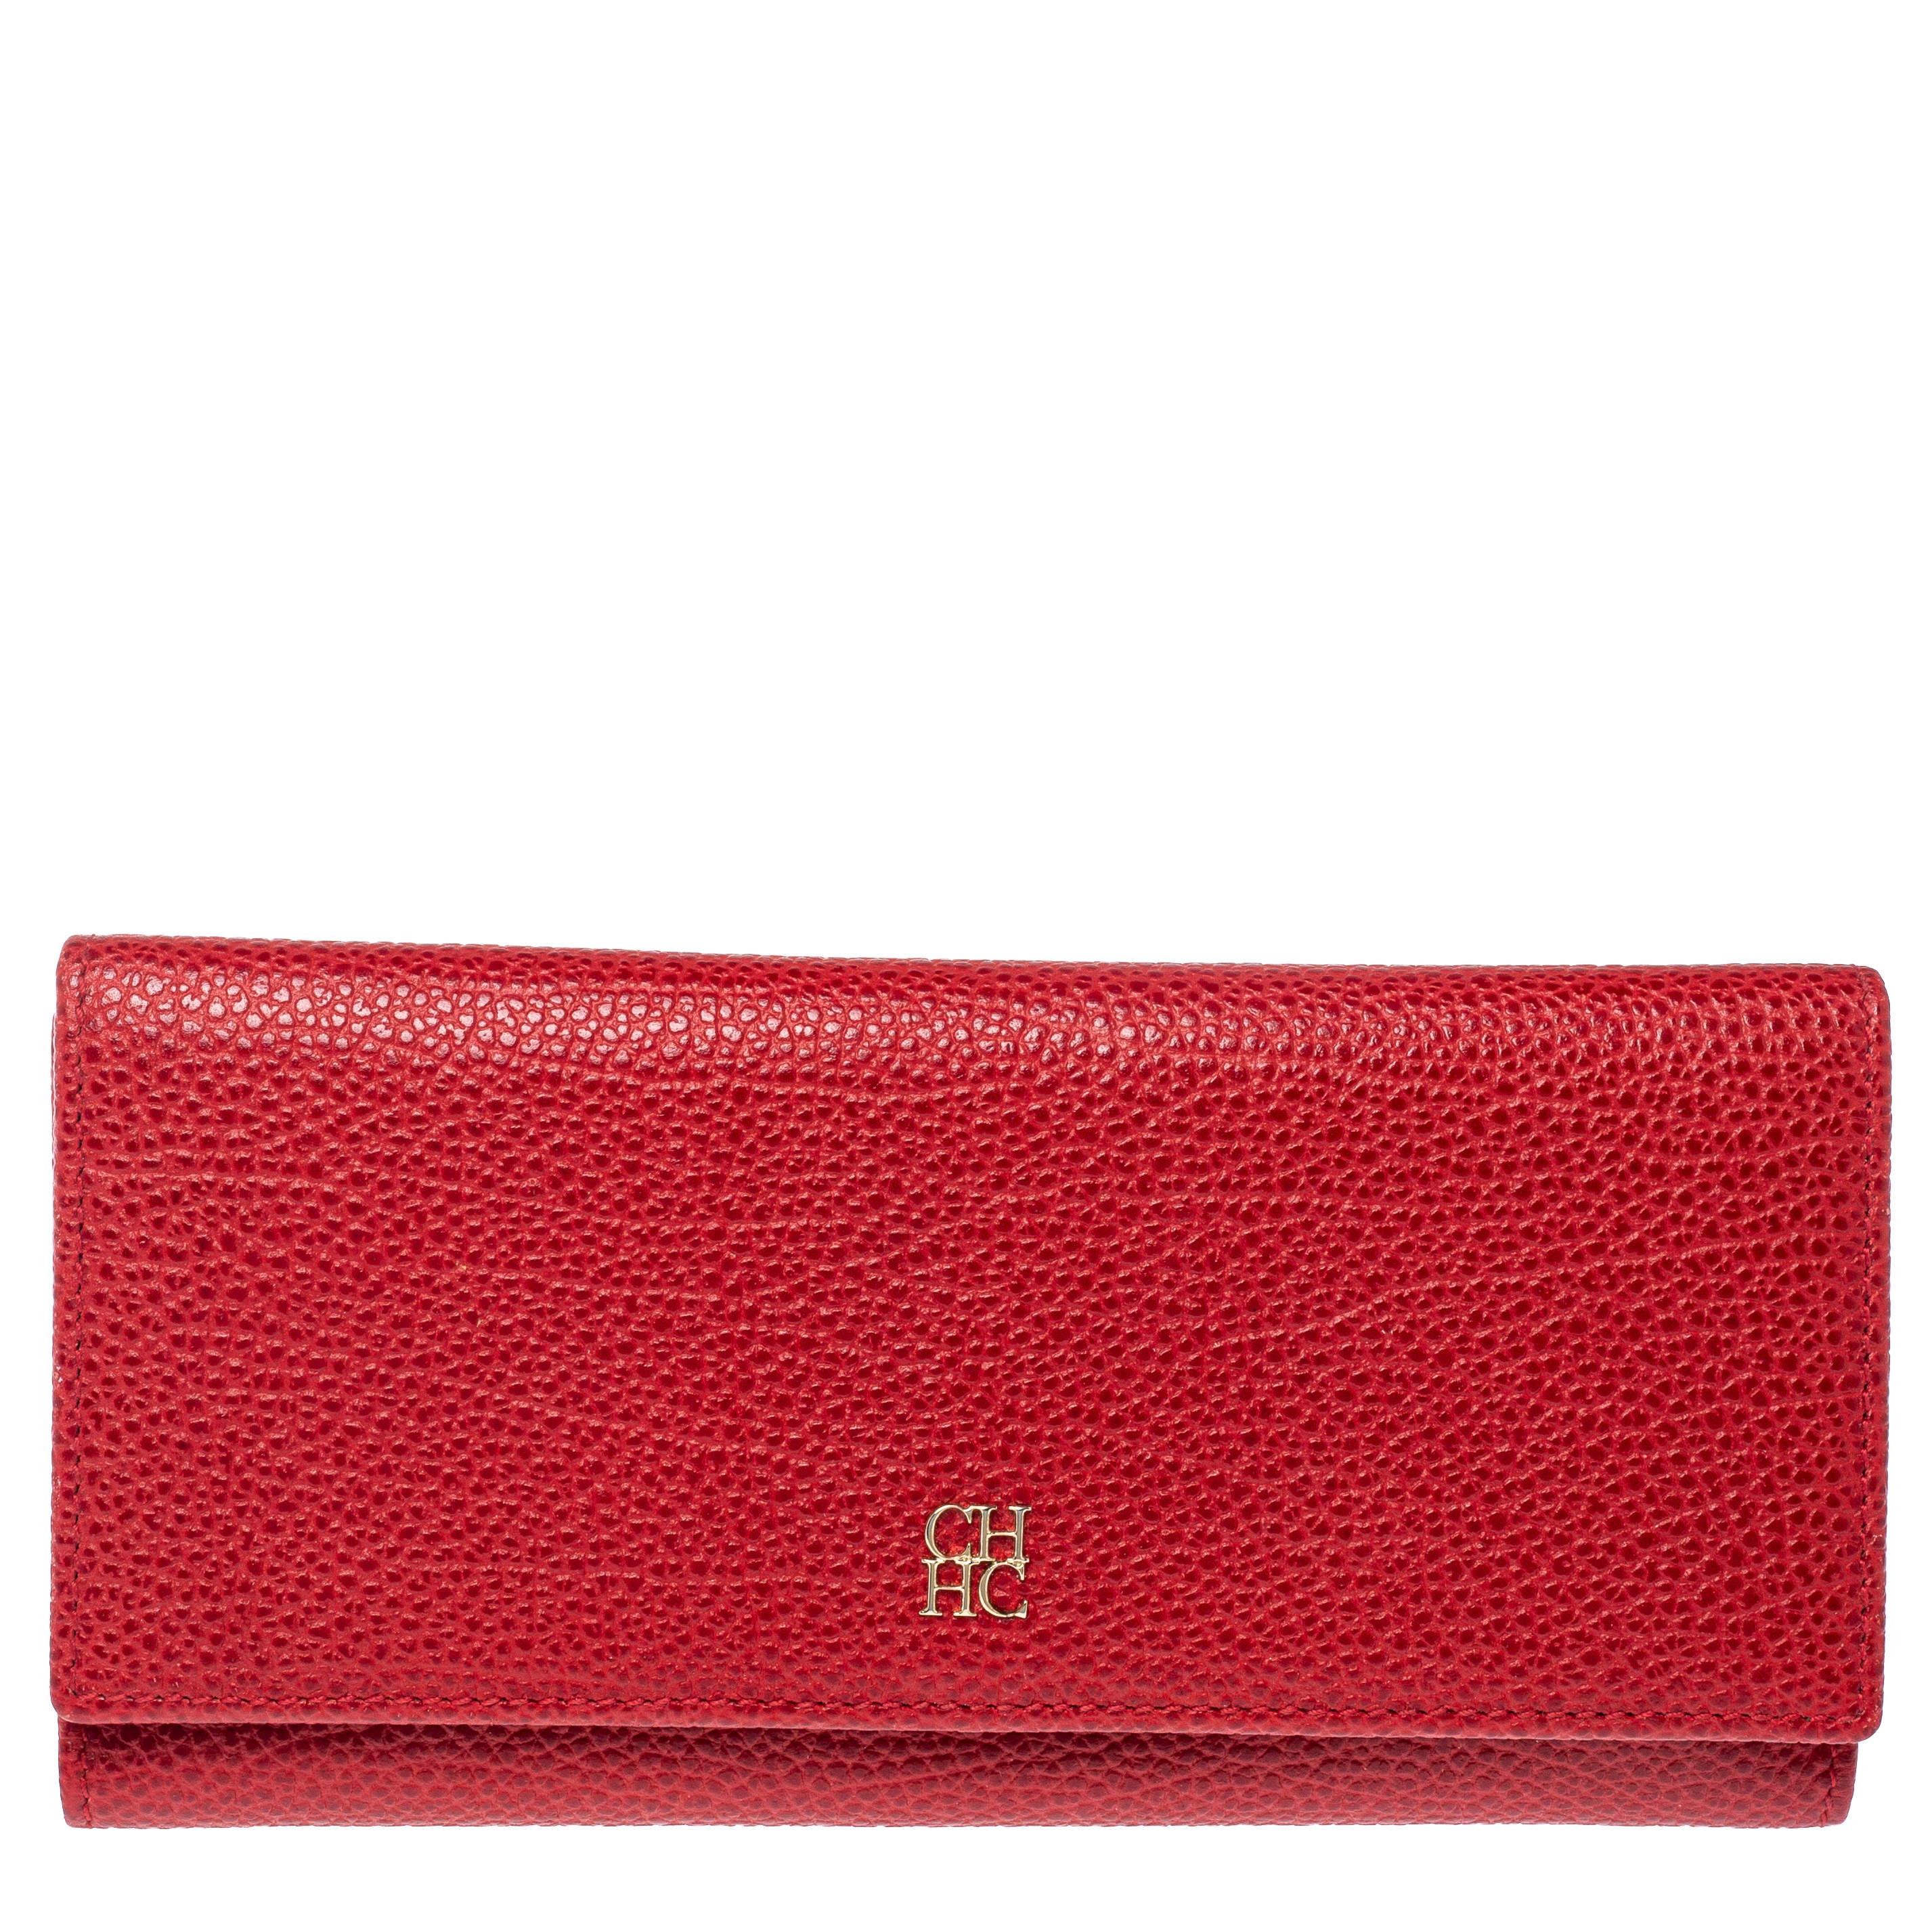 Carolina Herrera Red Leather Continental Wallet